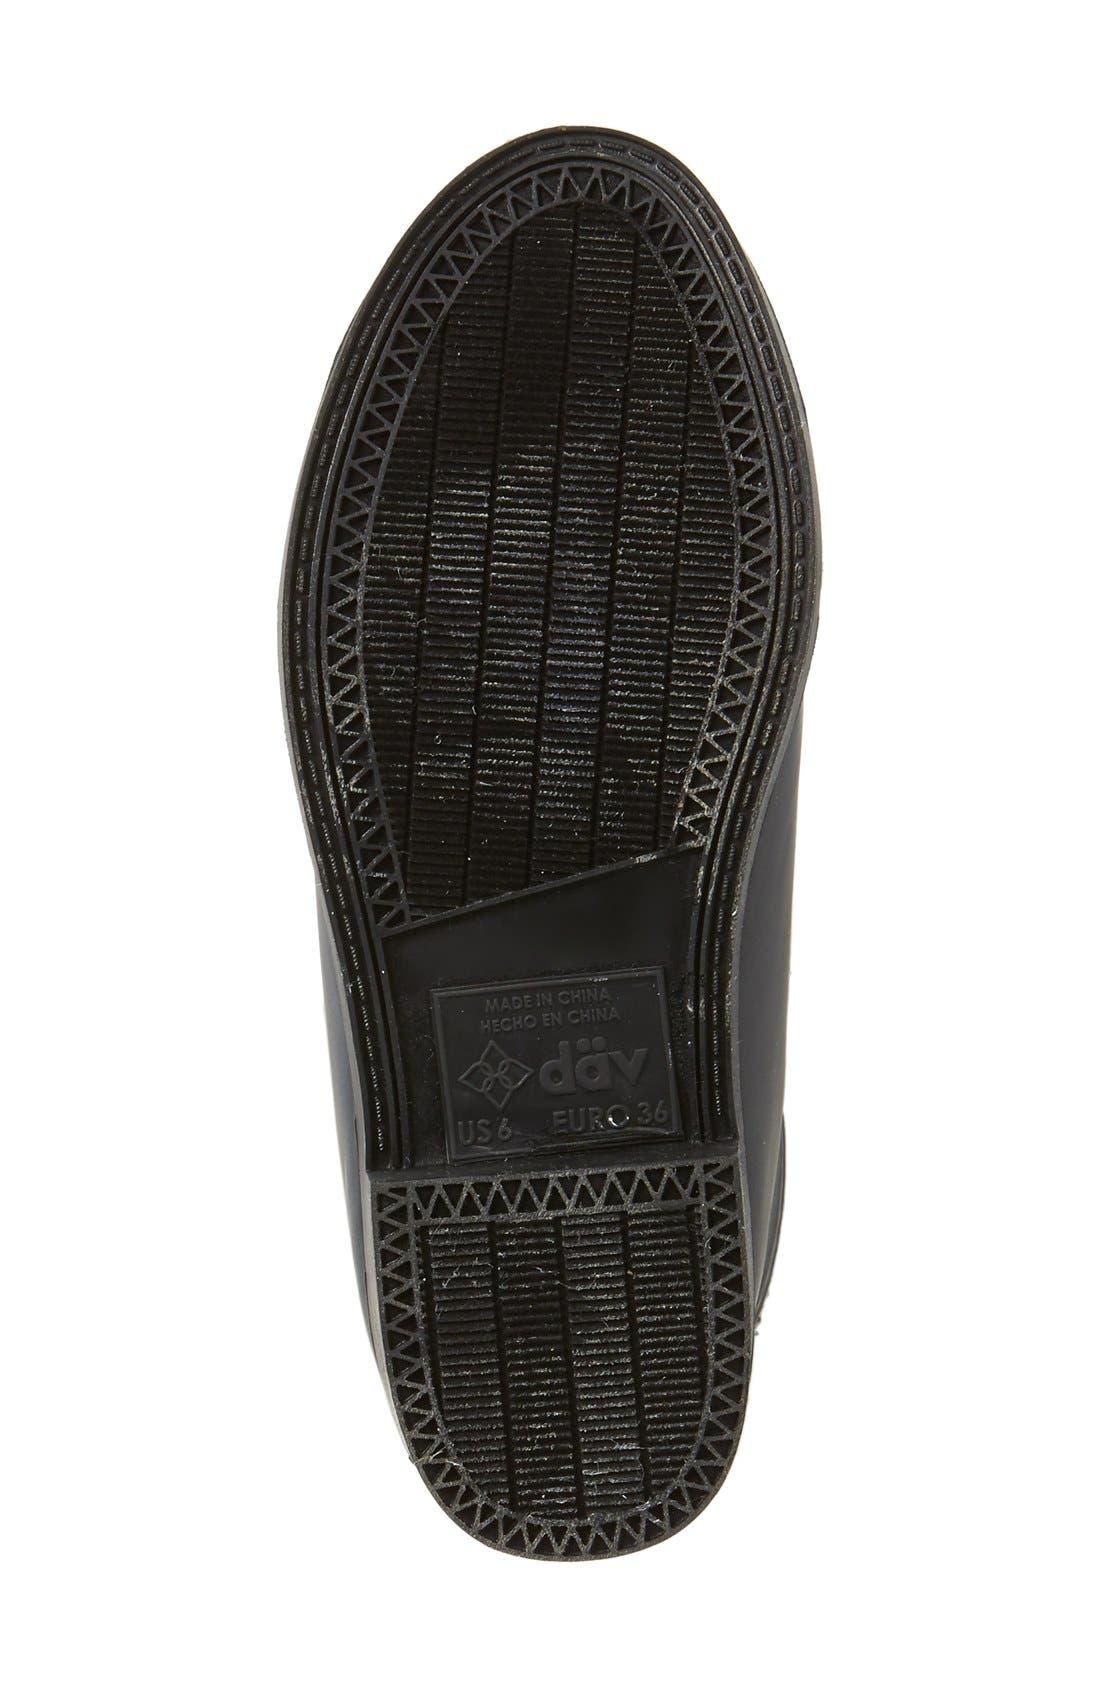 DÄV, Cardiff Tweed Knee High Waterproof Rain Boot, Alternate thumbnail 2, color, BLACK